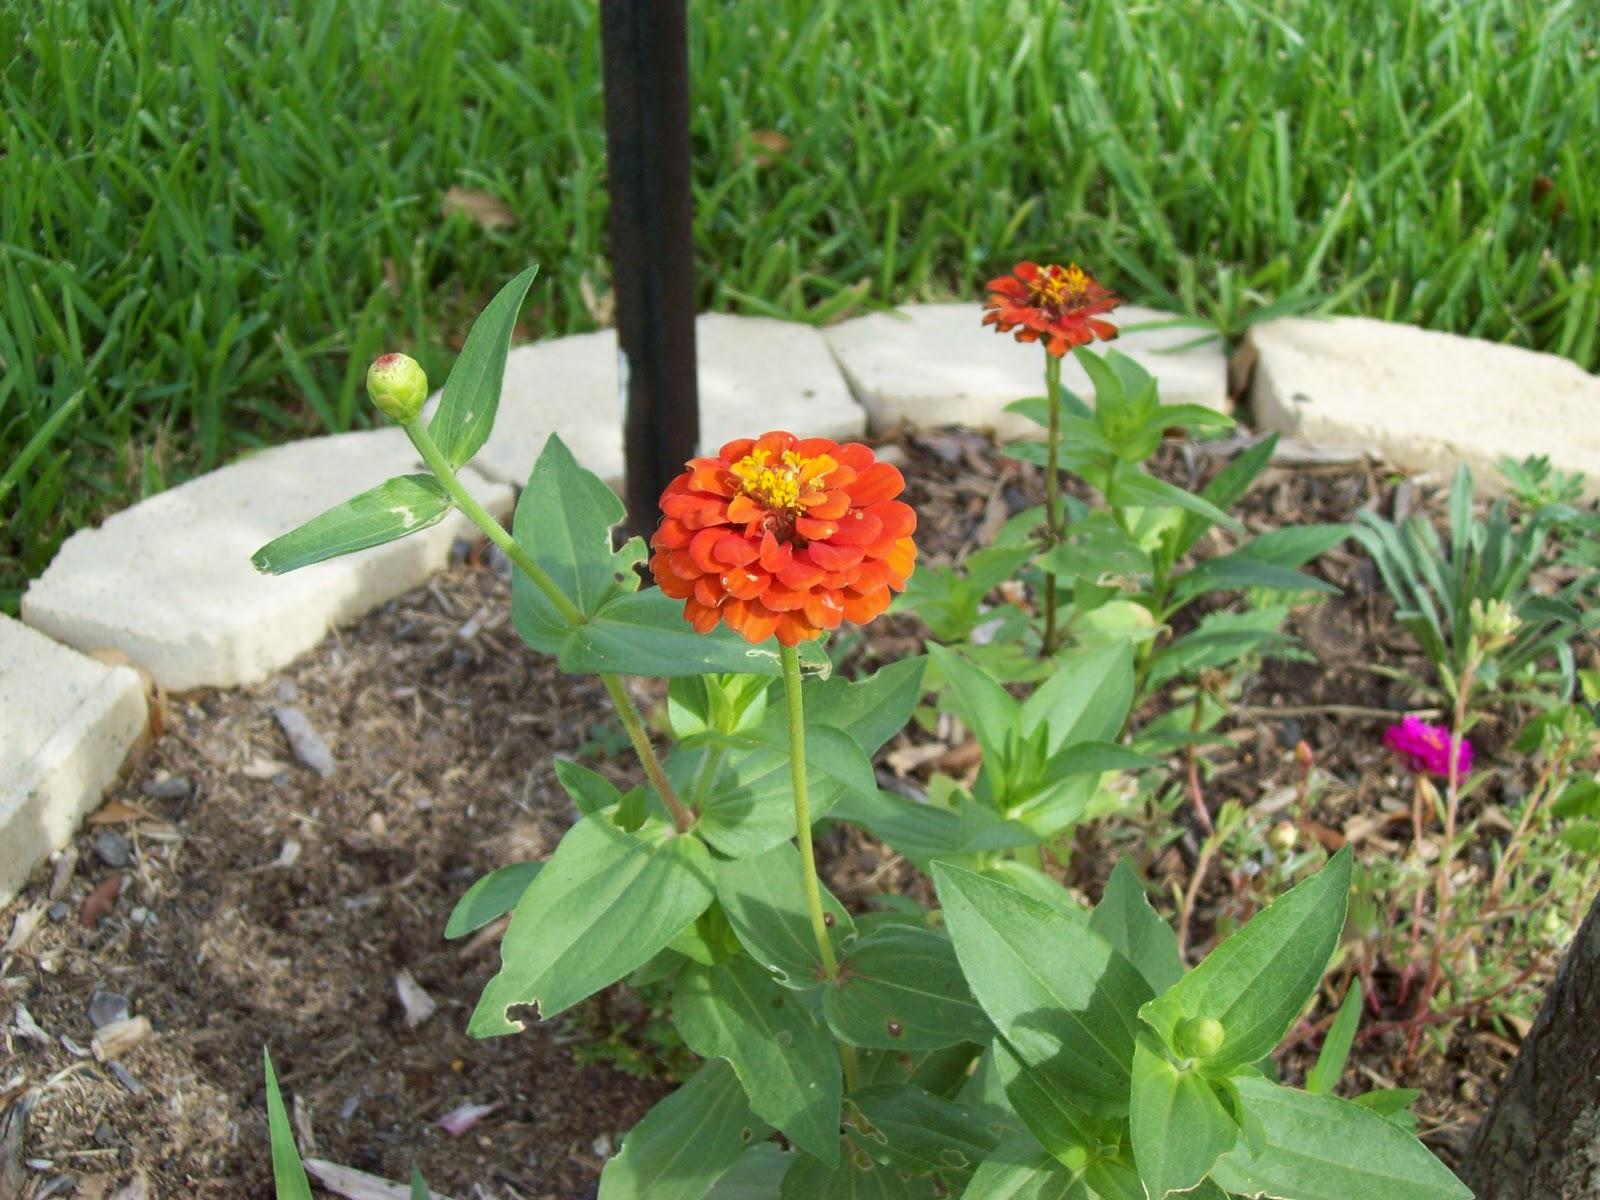 Gardening 2009 - 101_4445.JPG